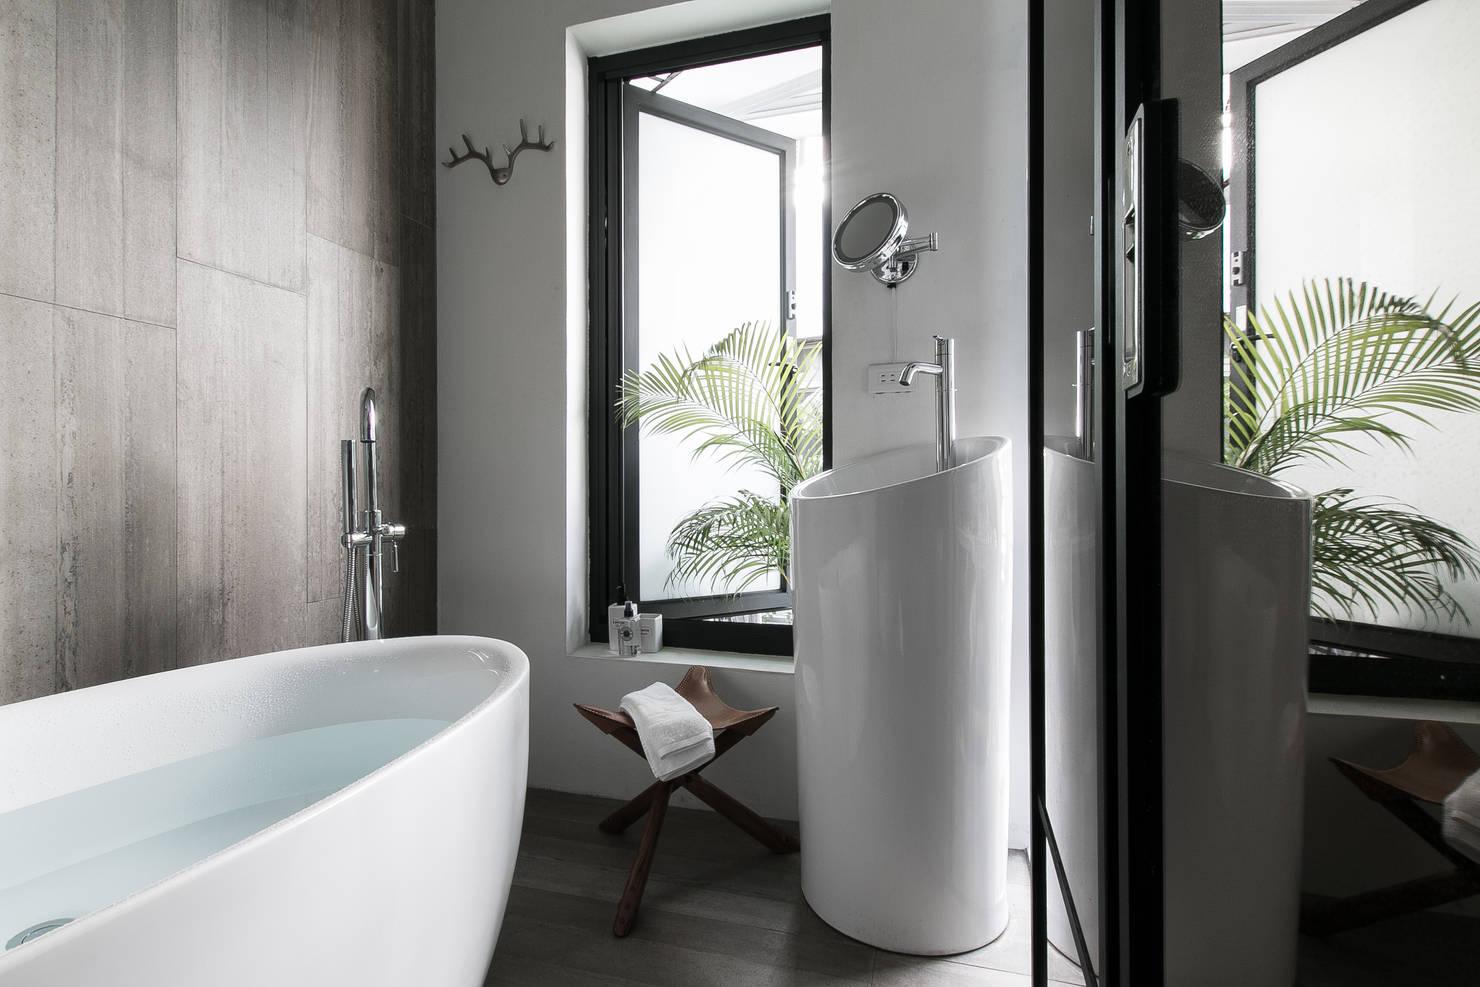 10 amazing bathrooms with bathtubs